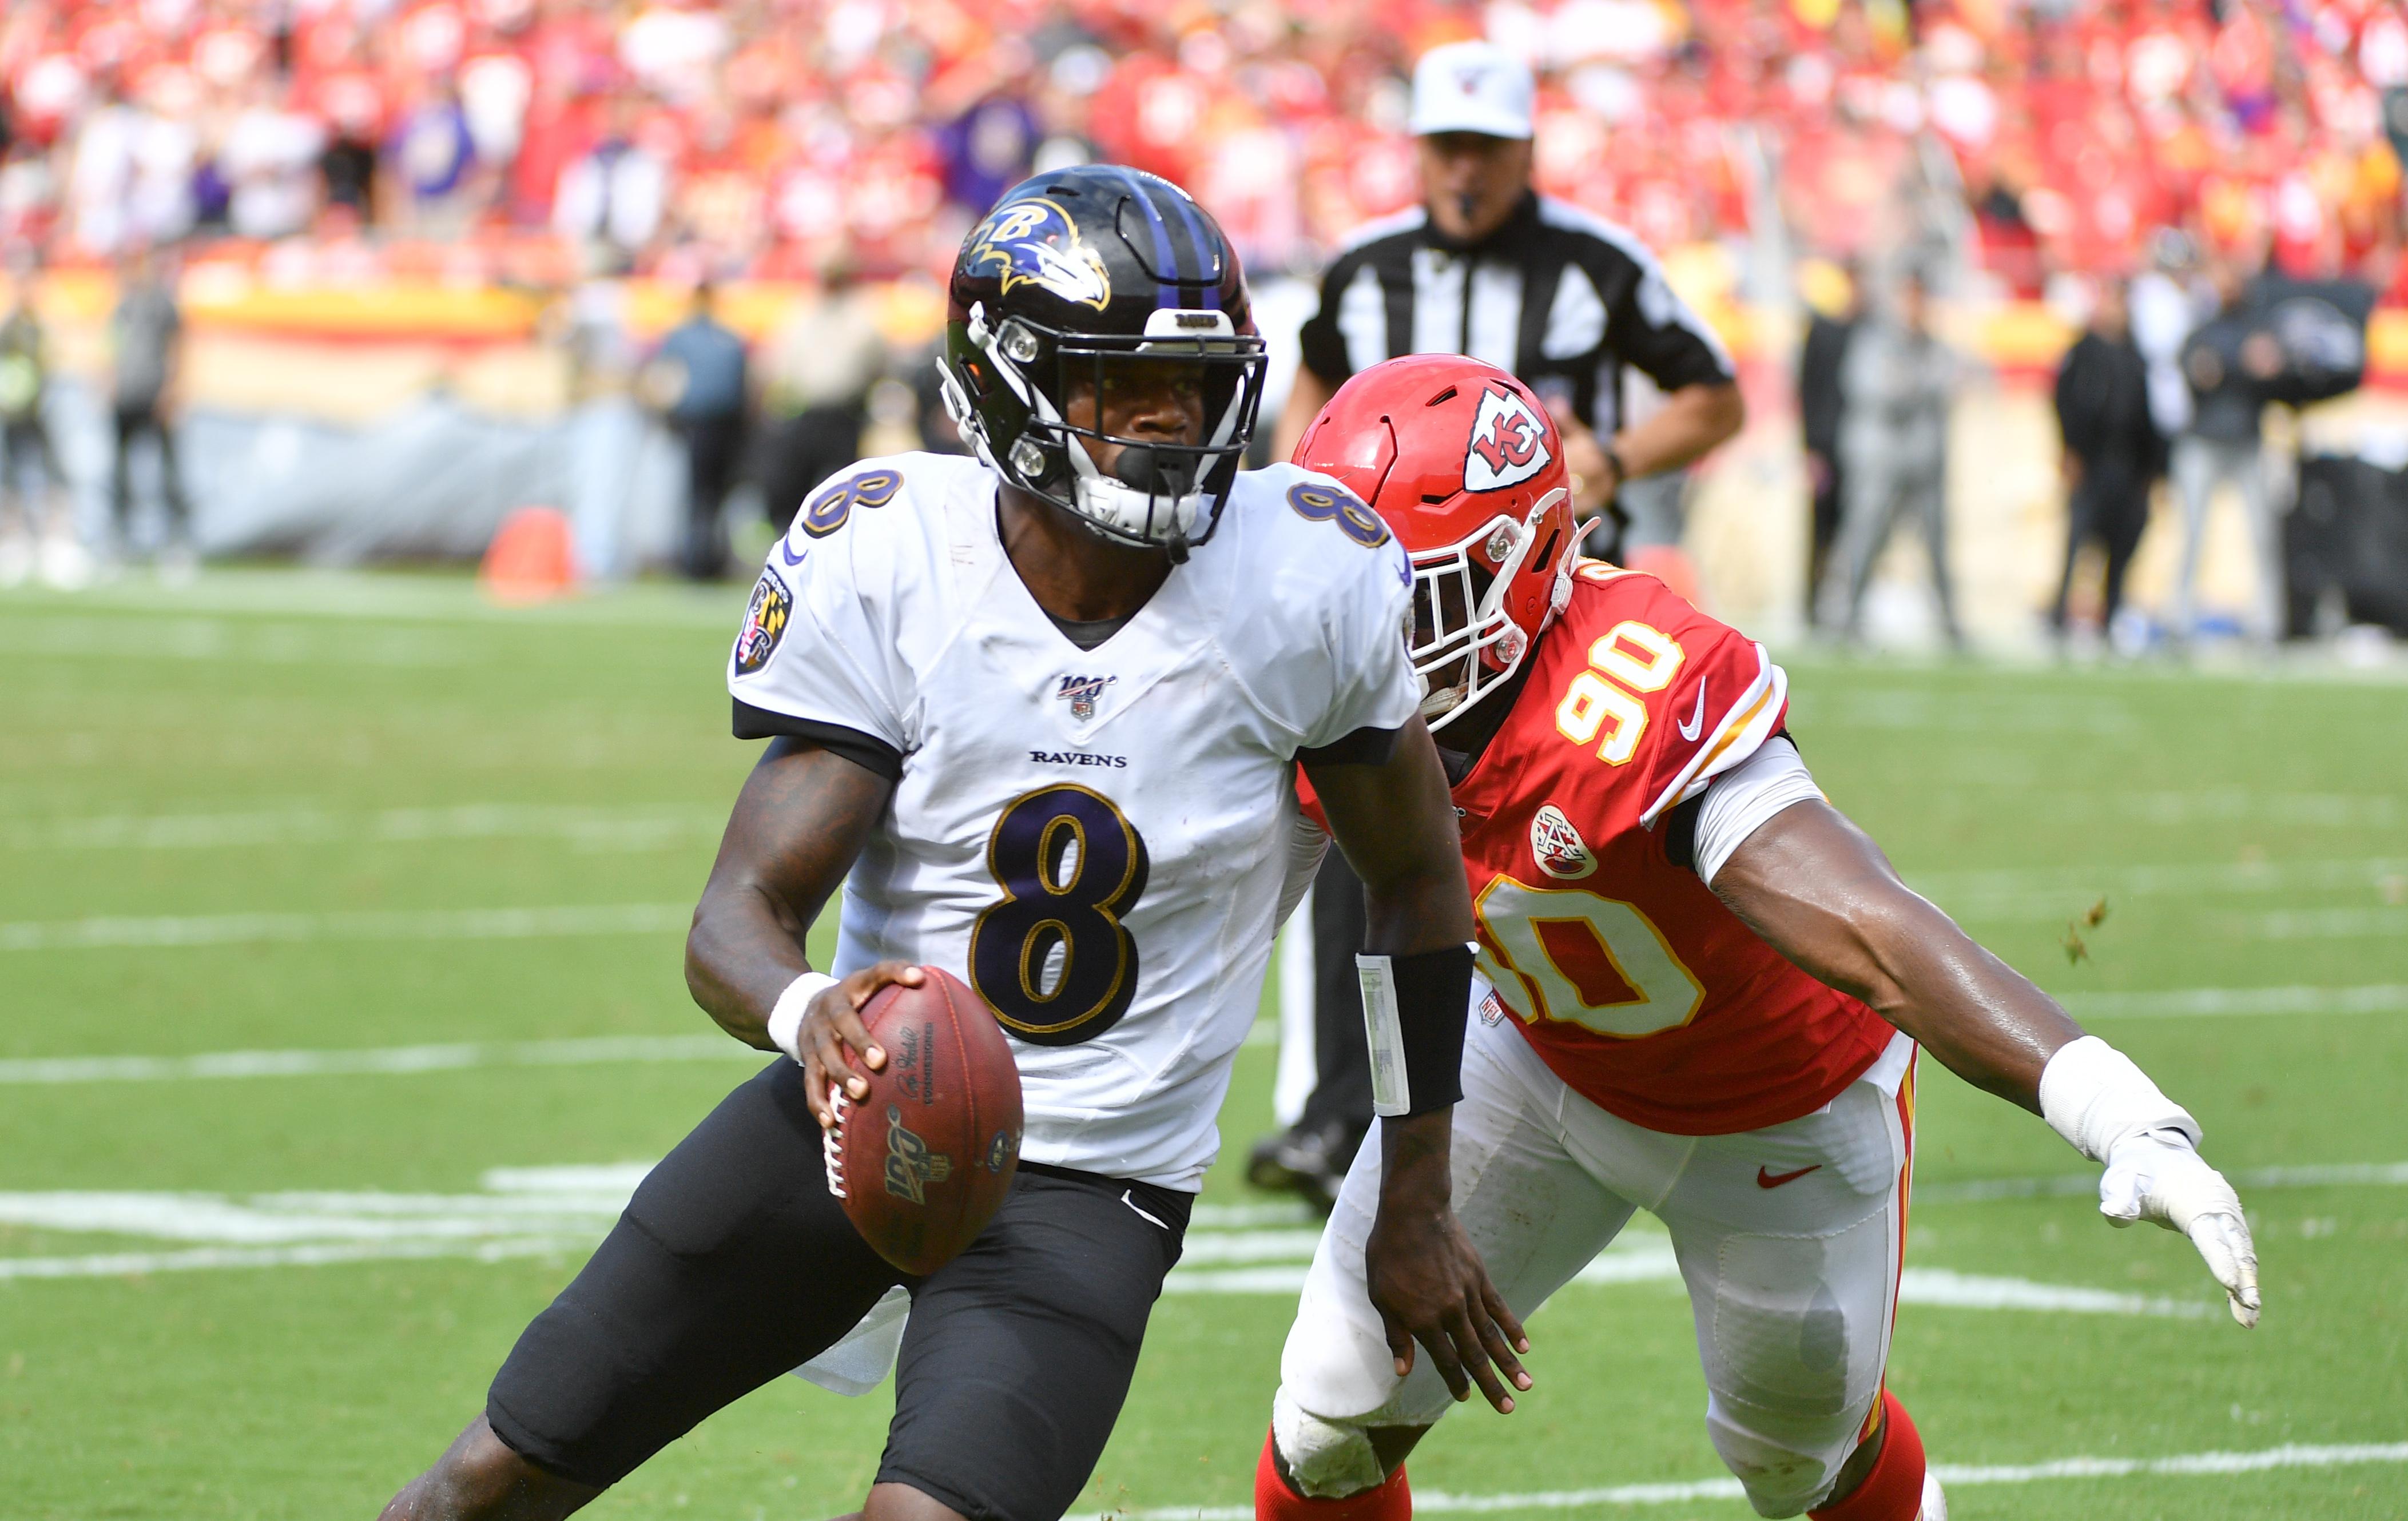 Ravens stun Kansas City behind Lamar's heroics, 36-35